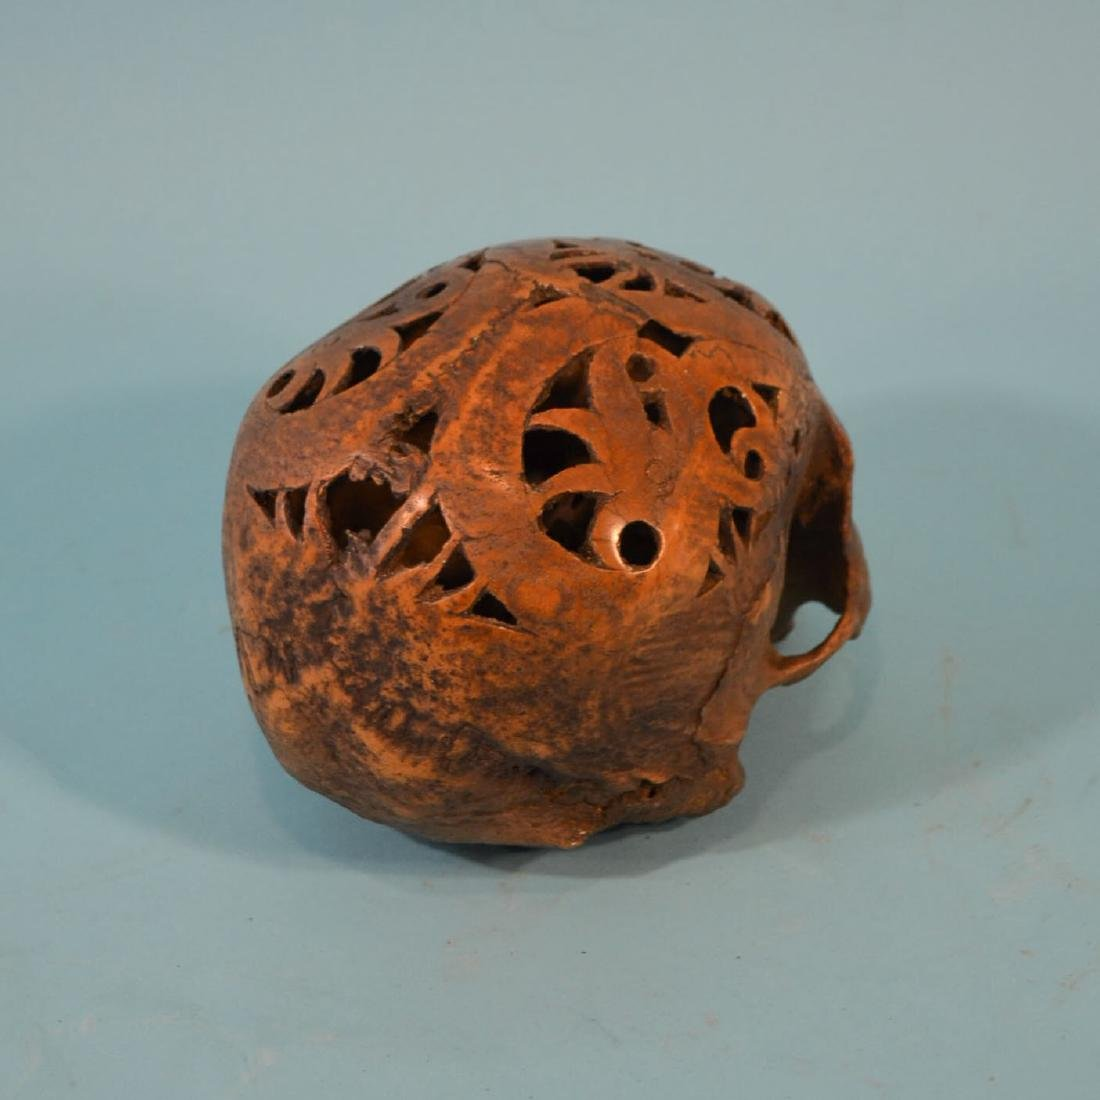 Carved Dayak Headhunting Trophy Skull - 2